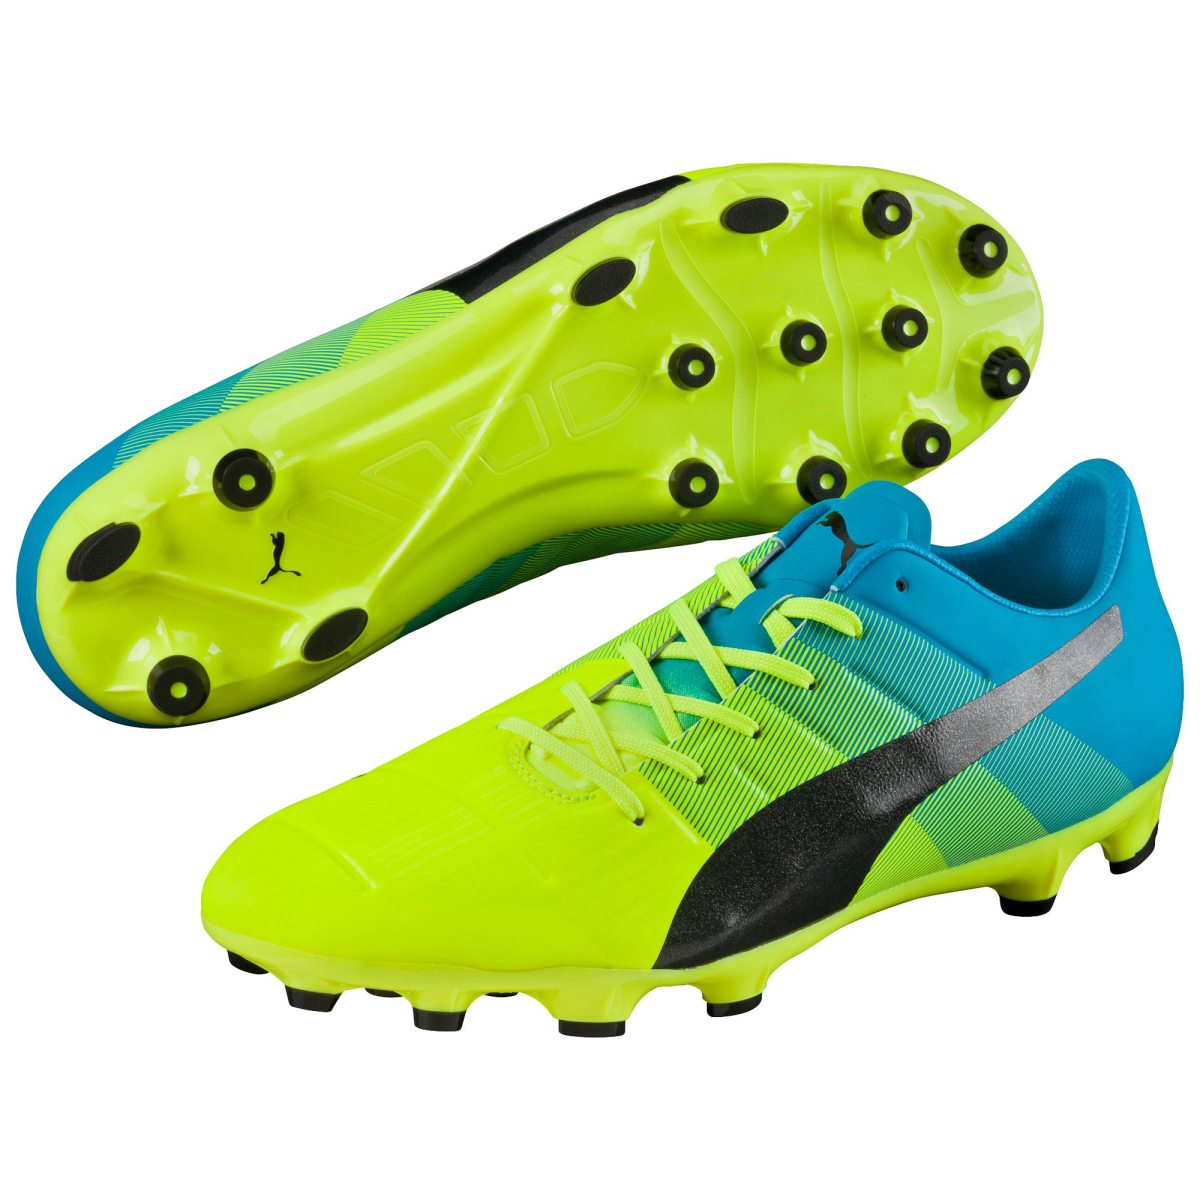 brand new 655b7 0de27 puma evopower 2.3 ag q1 16 fotbollssko senior fotbollsskor